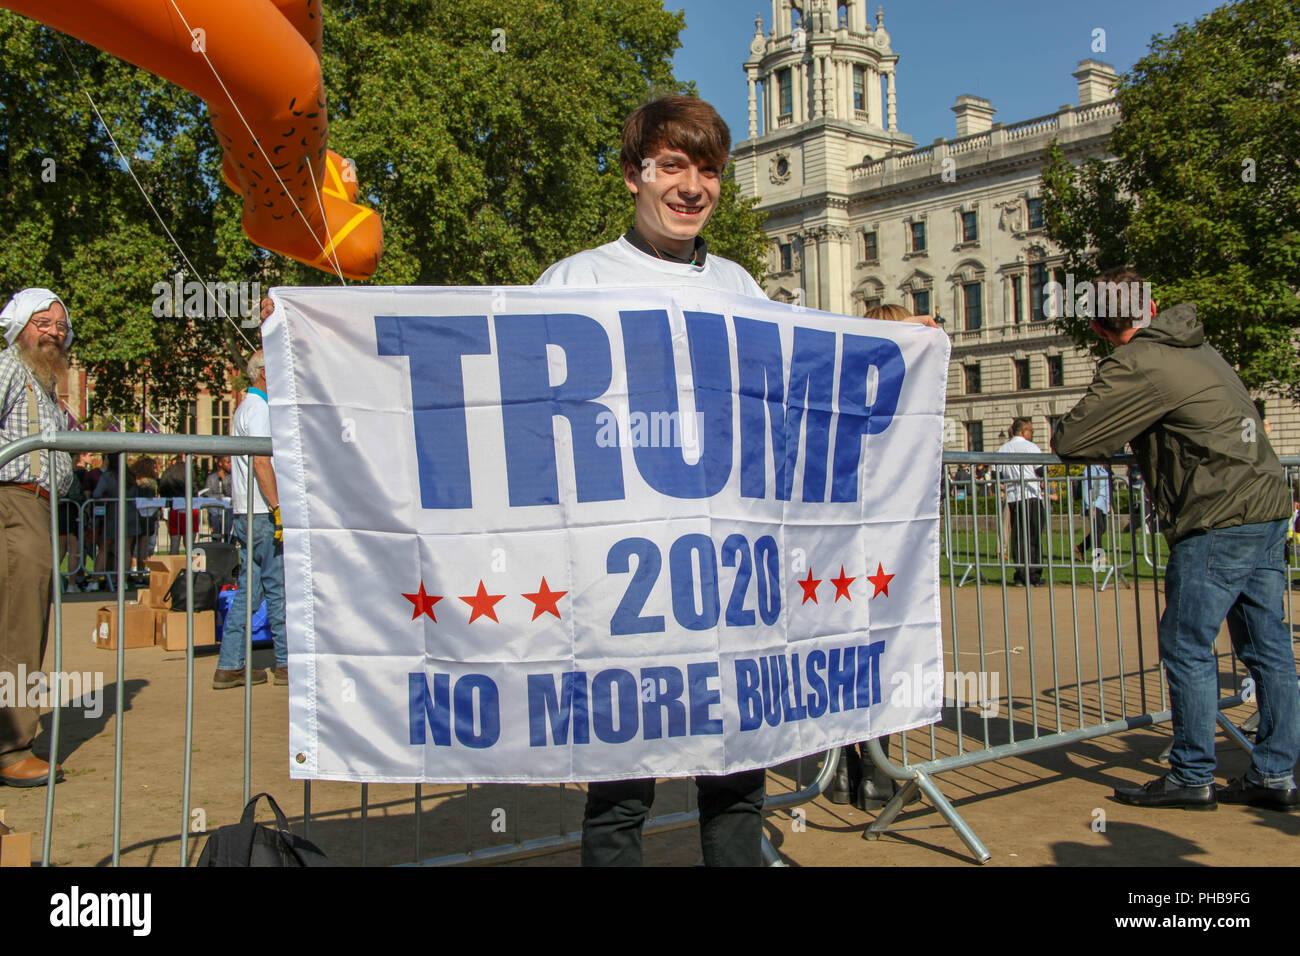 London, UK. 1st September 2018. Supporter of Donald Trump with the Sadiq Khan Balloon Credit: Alex Cavendish/Alamy Live News - Stock Image